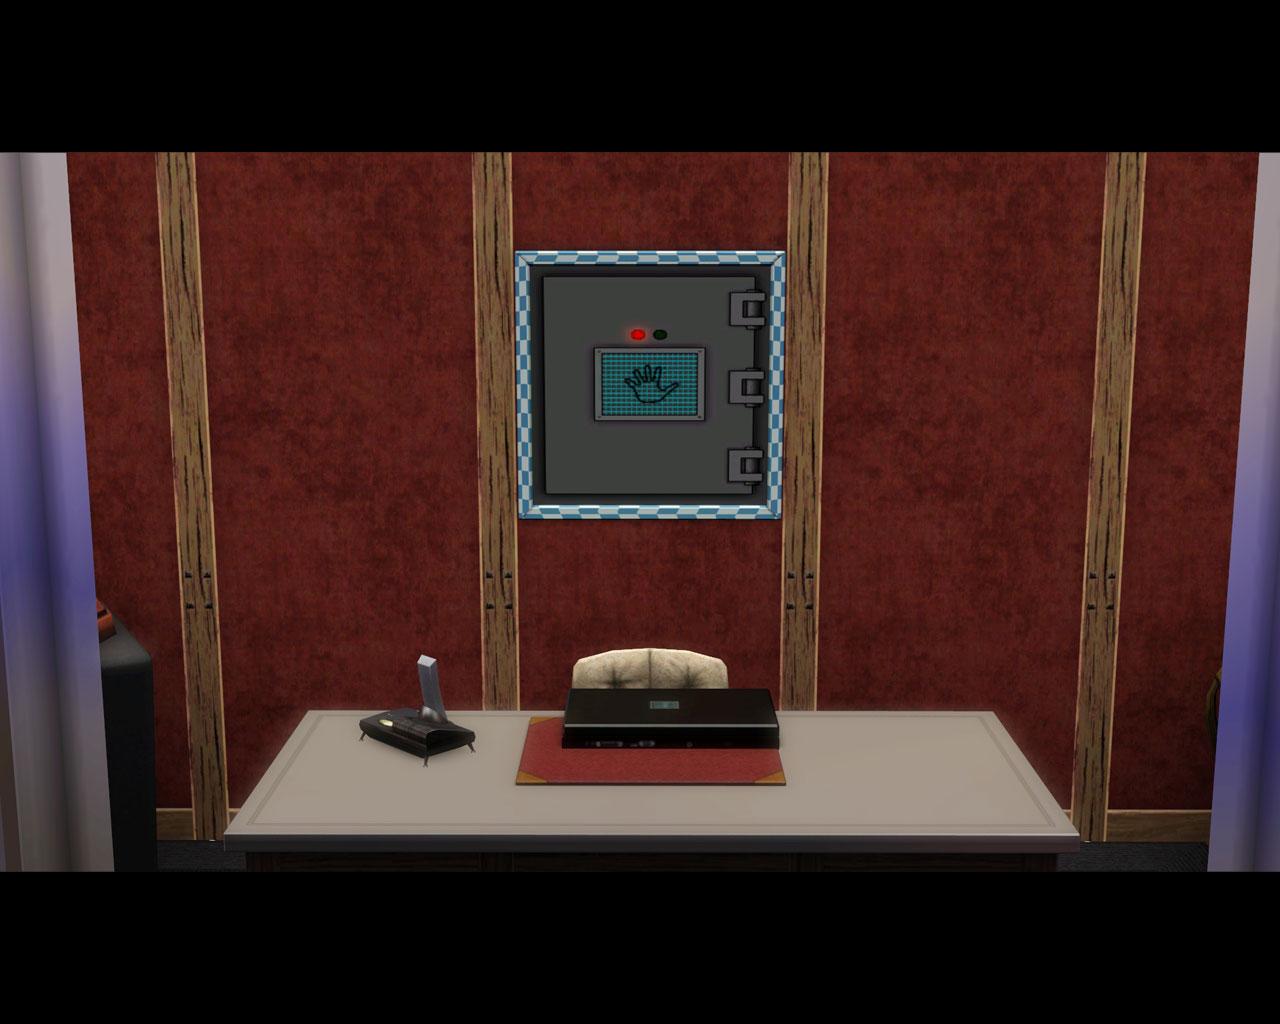 Mod The Sims Biometric Wall Safe